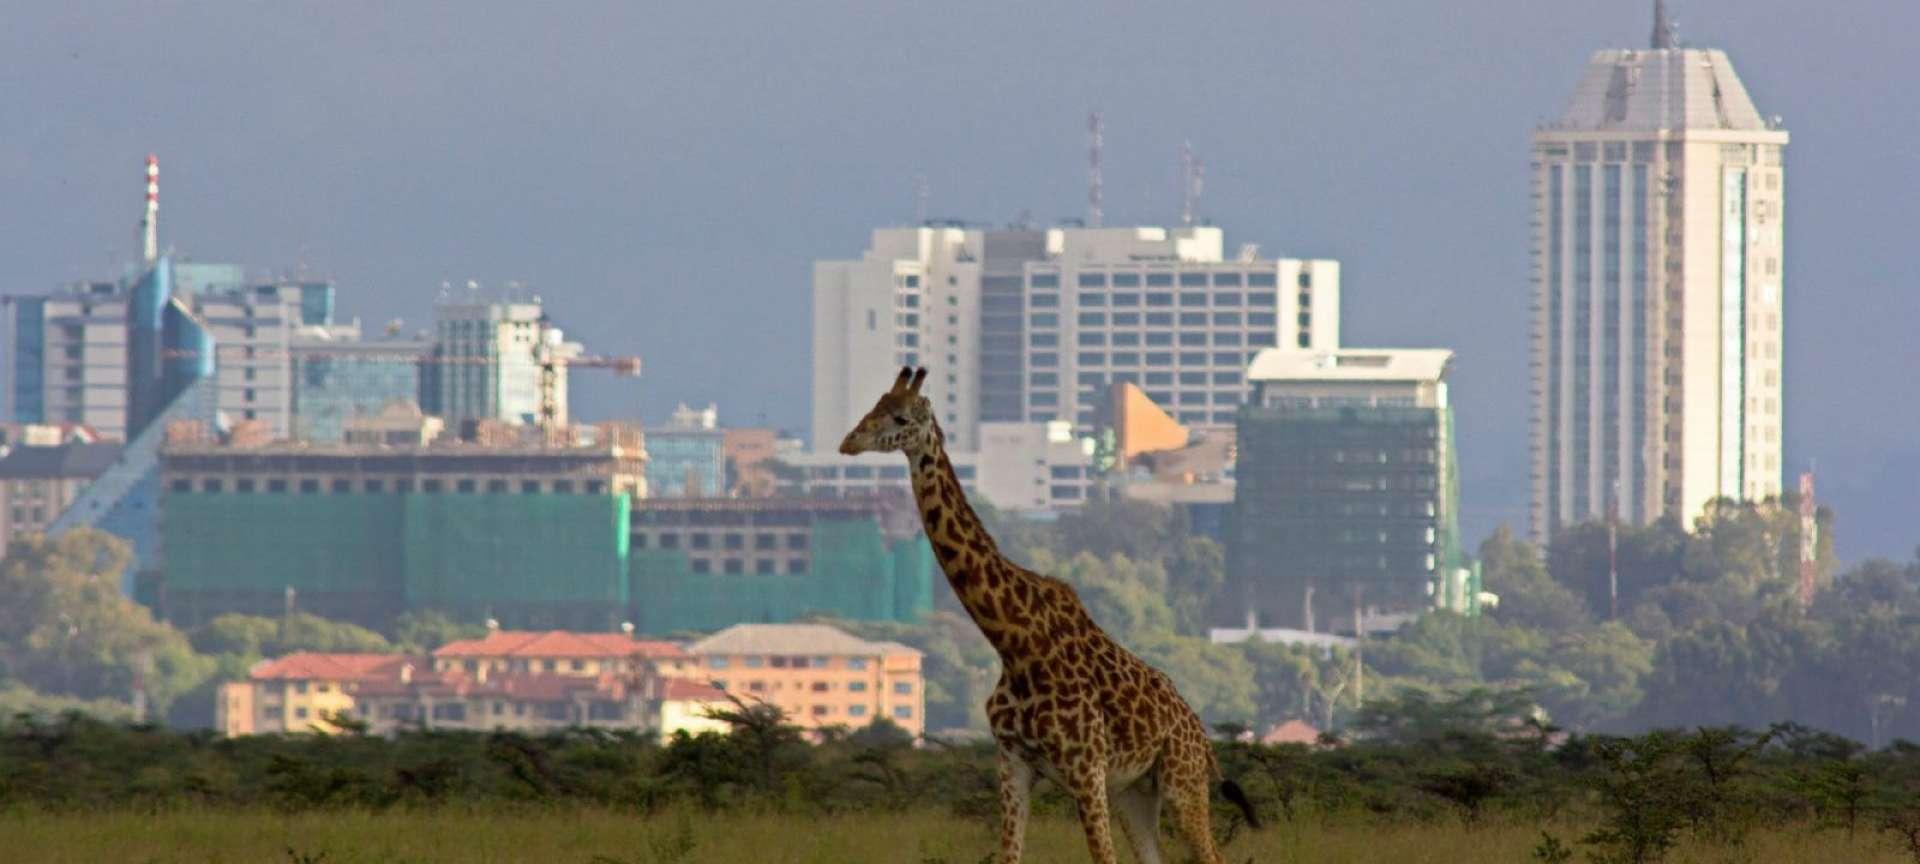 Nairobi - Africa Wildlife Safaris